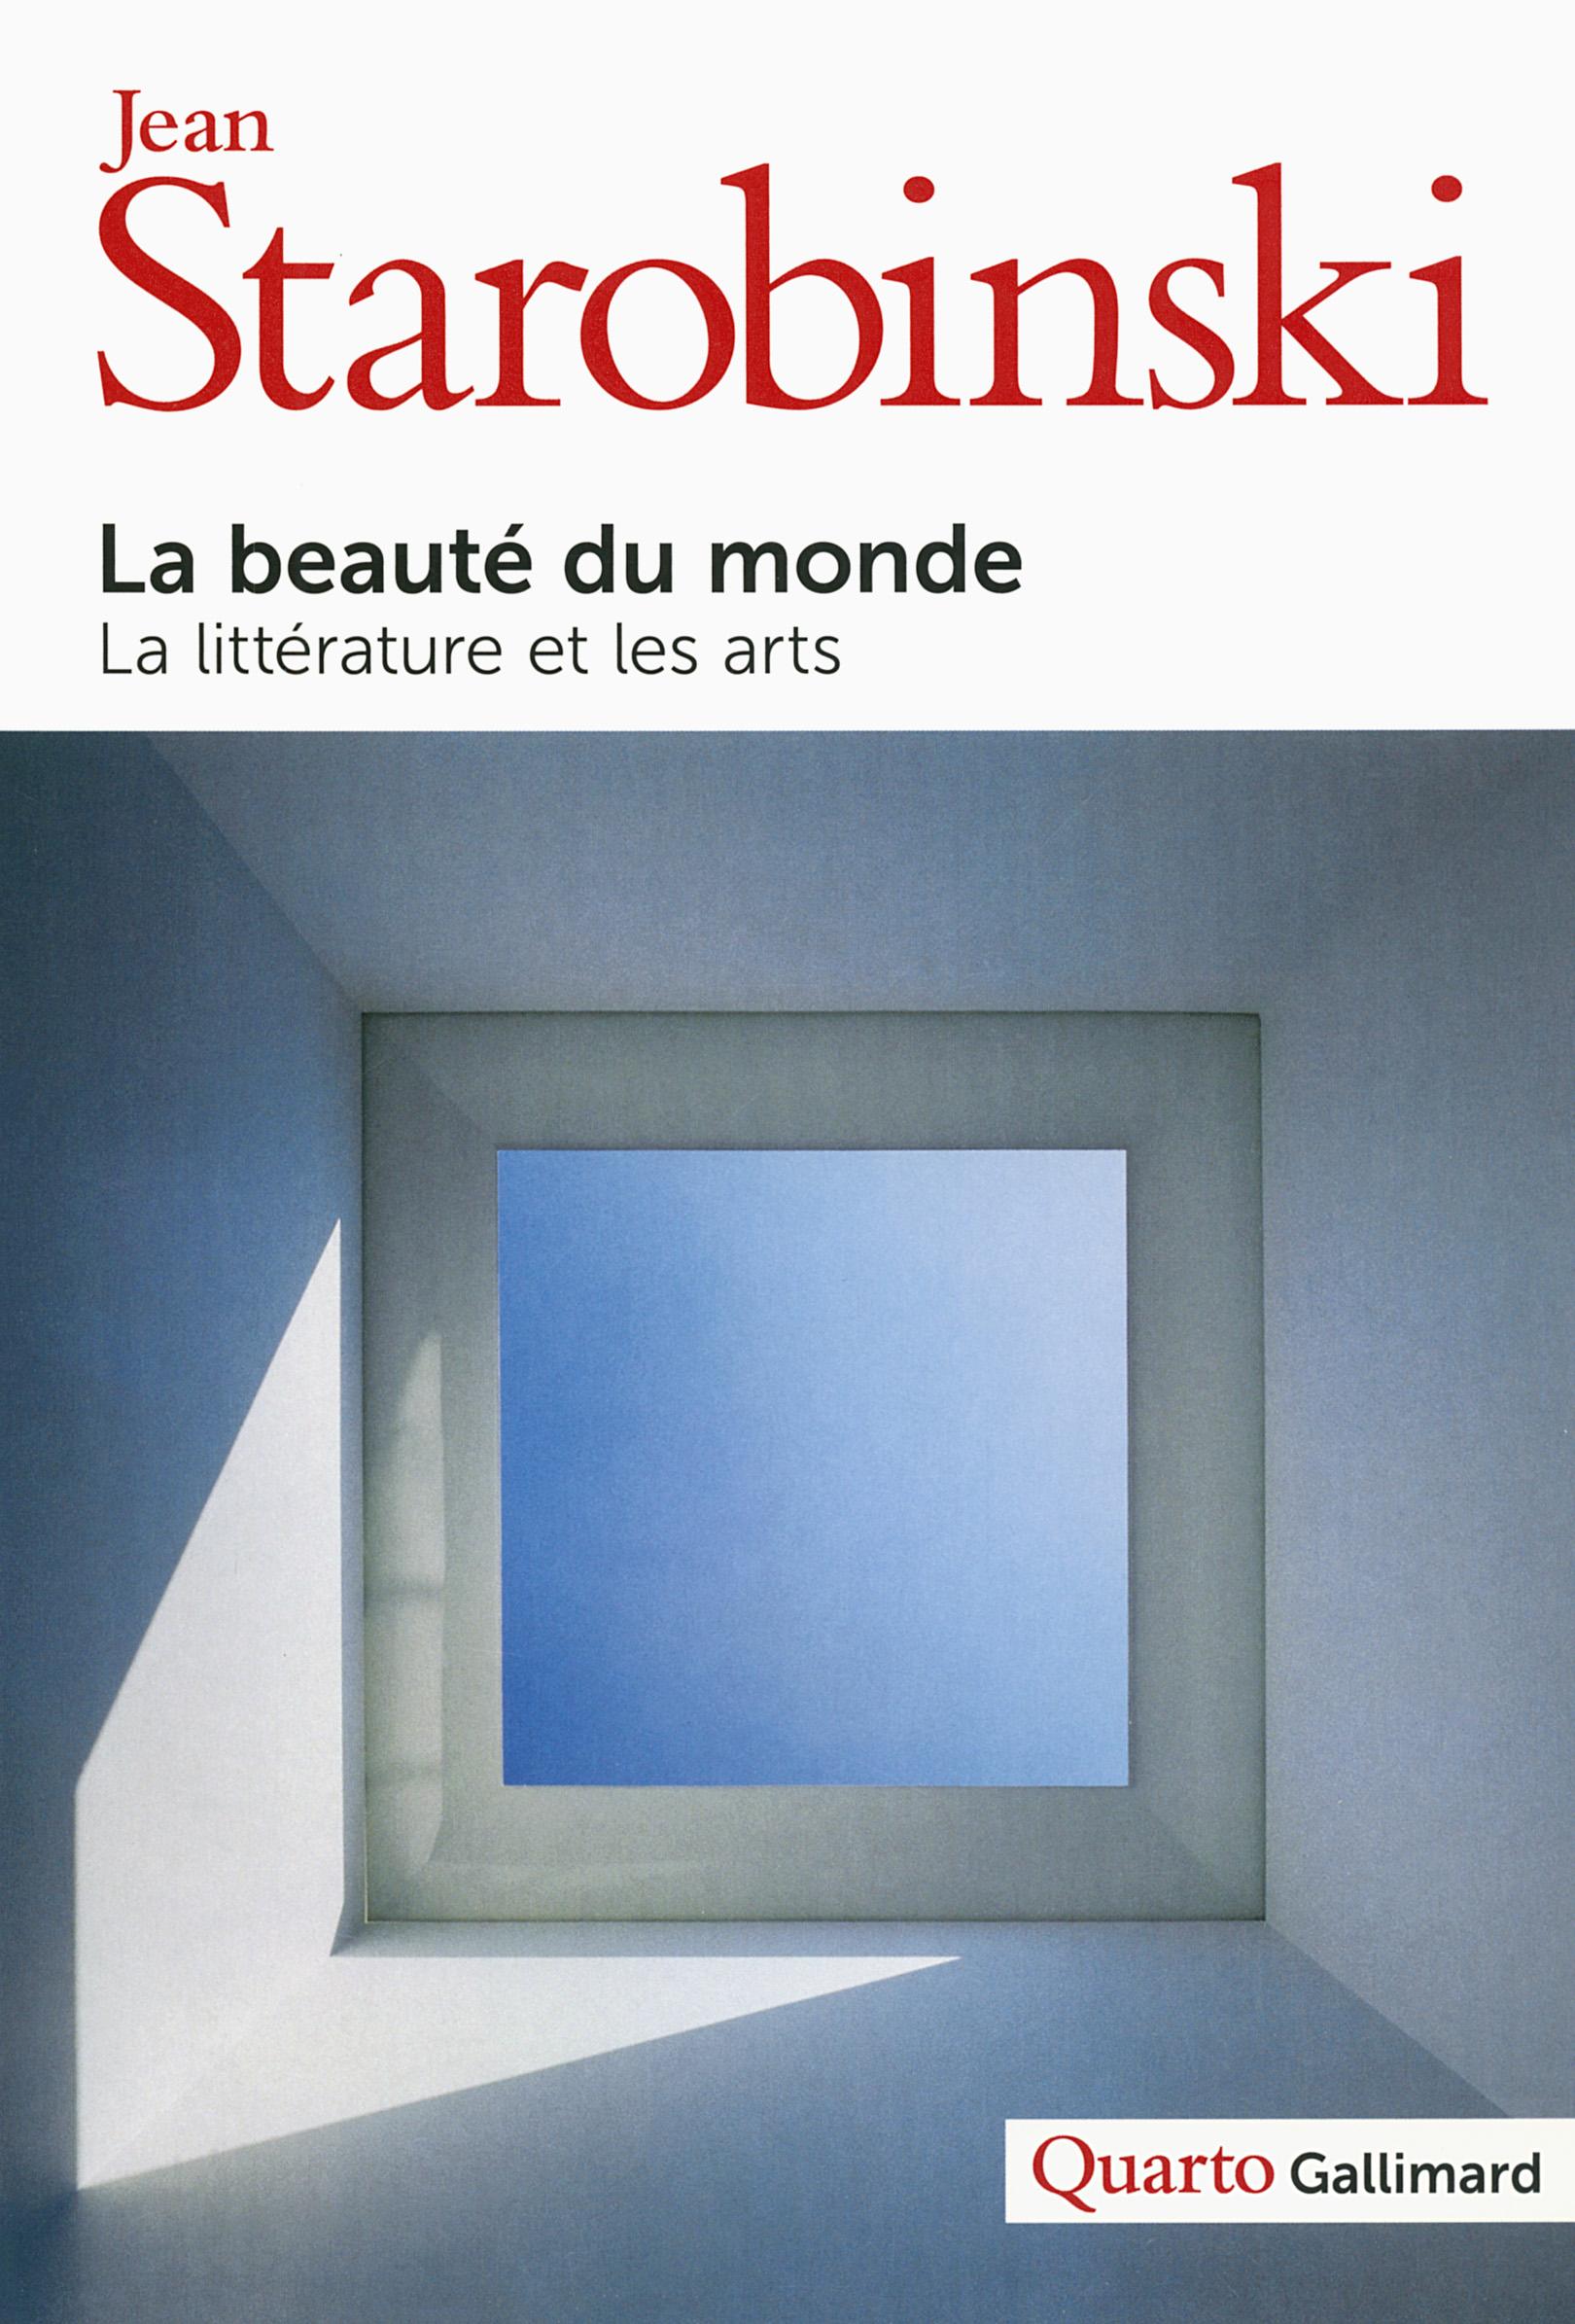 J. Starobinski, La Beauté du monde (éd. M. Rueff)